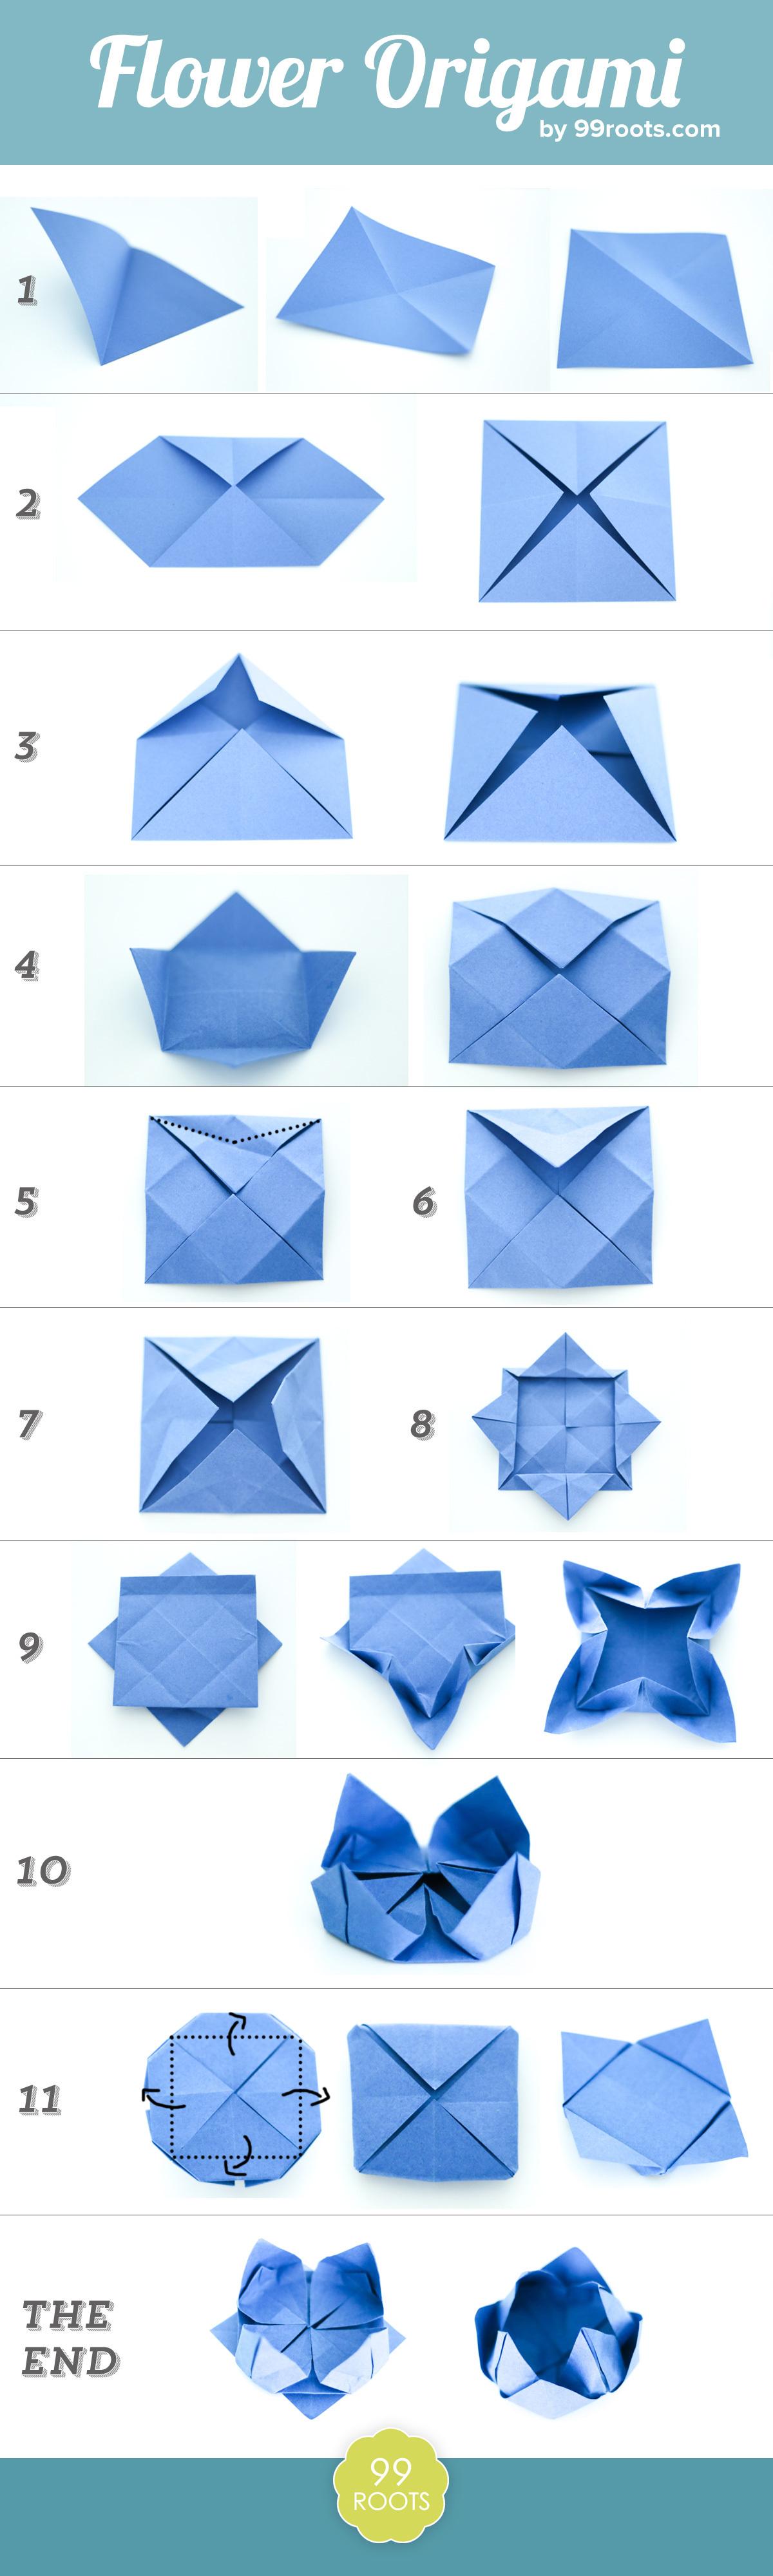 sherlock black lotus google search origami pinterest origami flower and origami paper. Black Bedroom Furniture Sets. Home Design Ideas